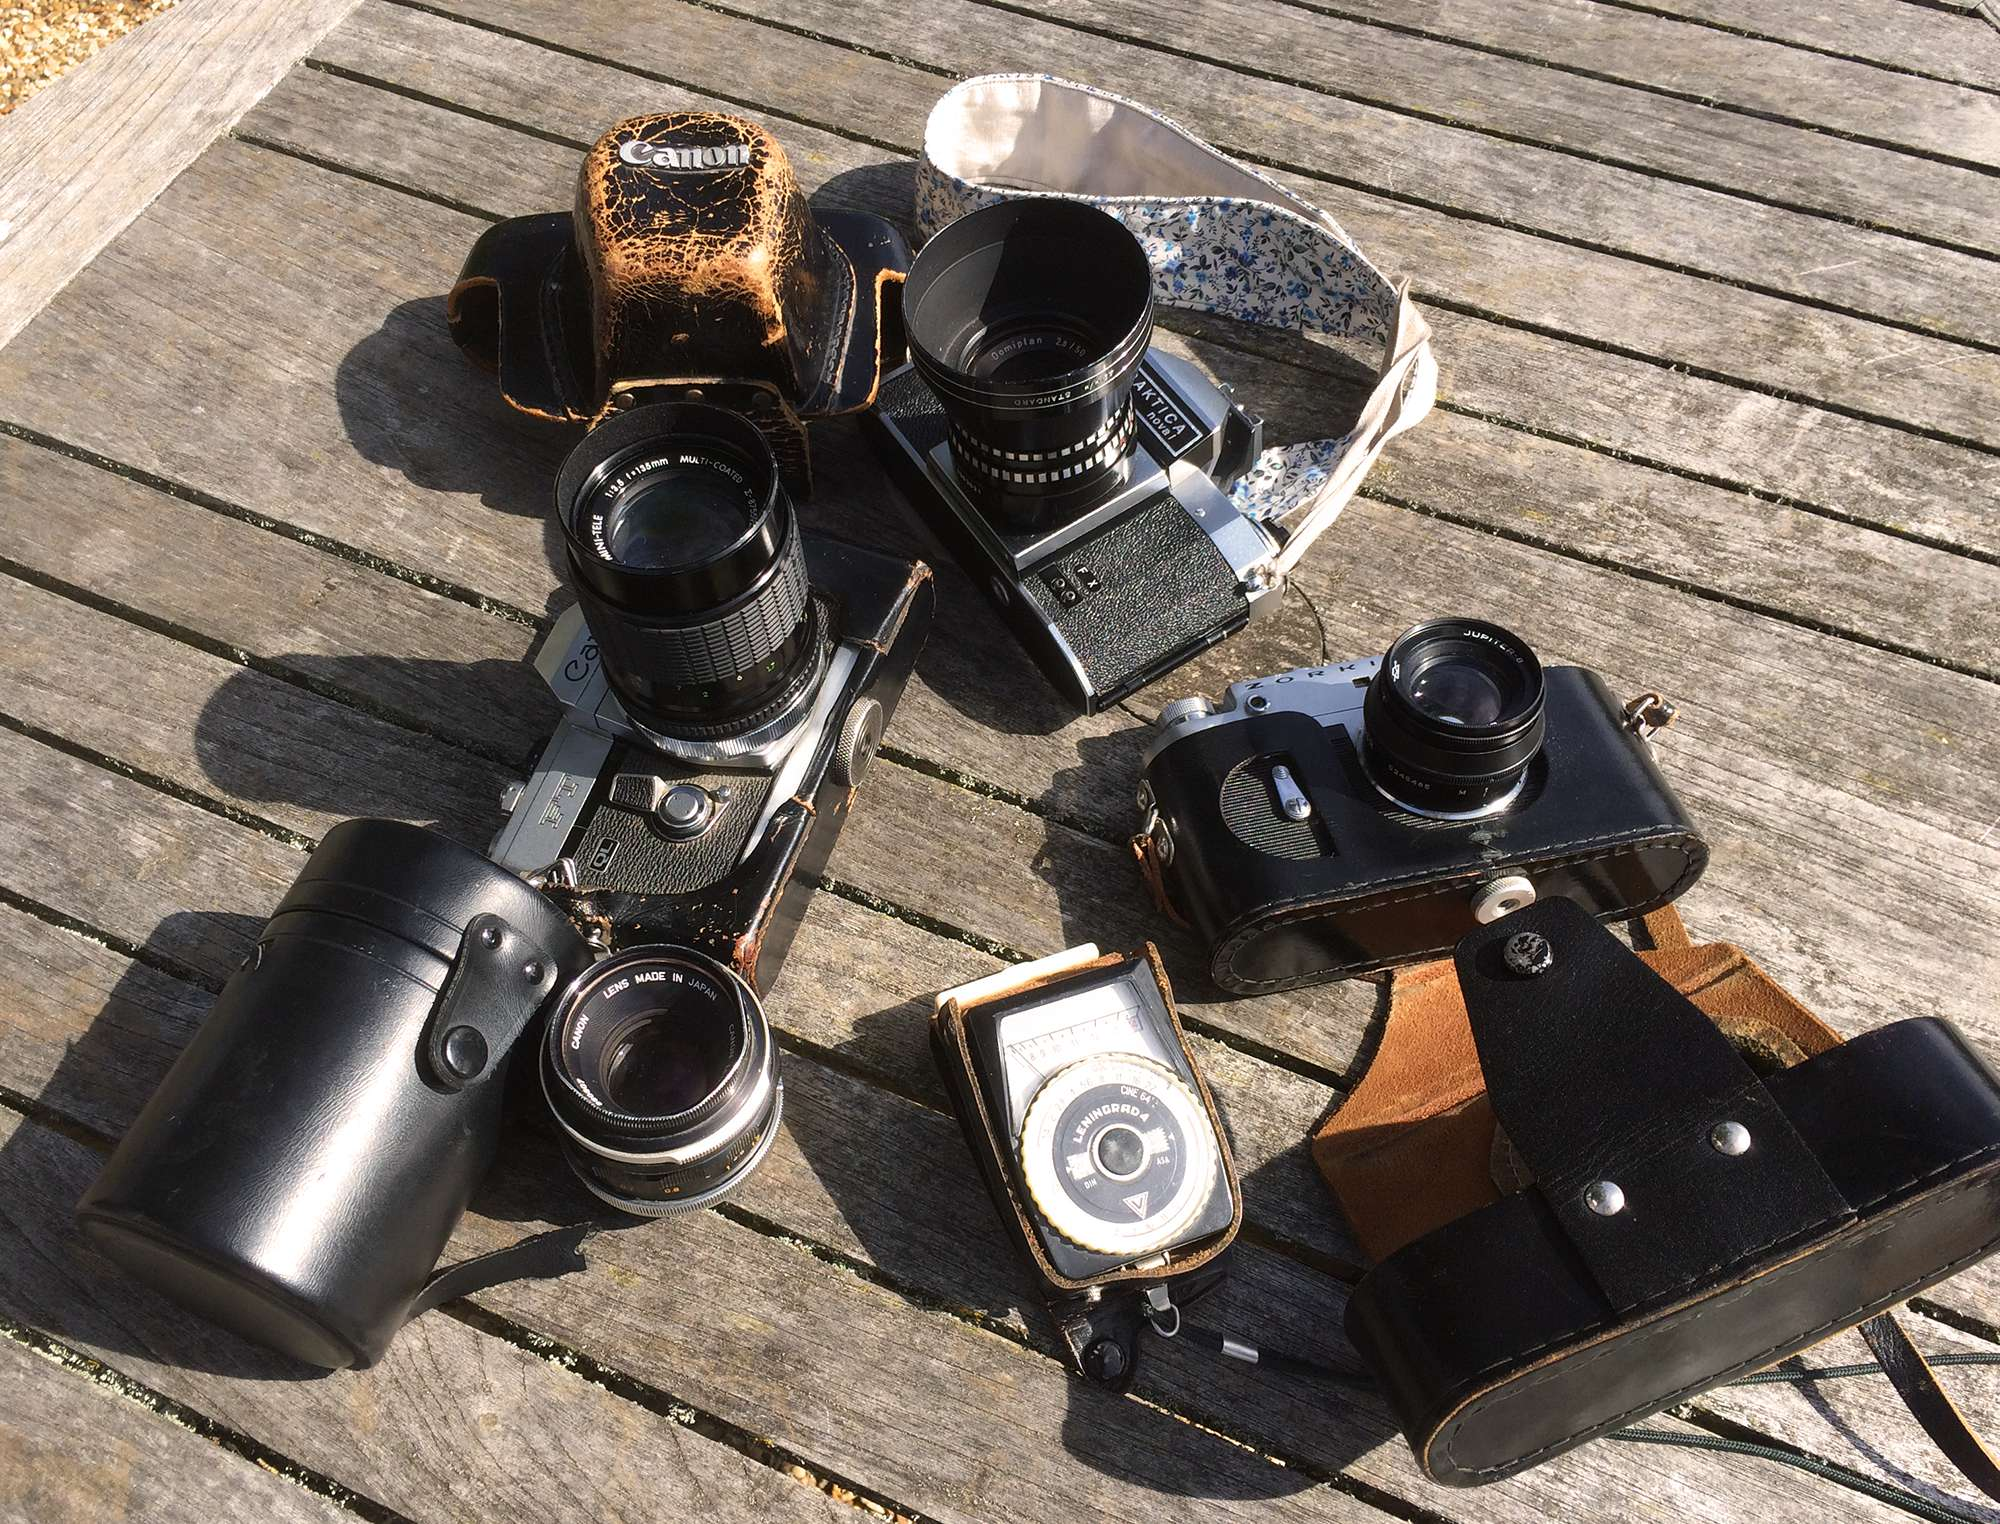 Camera stack